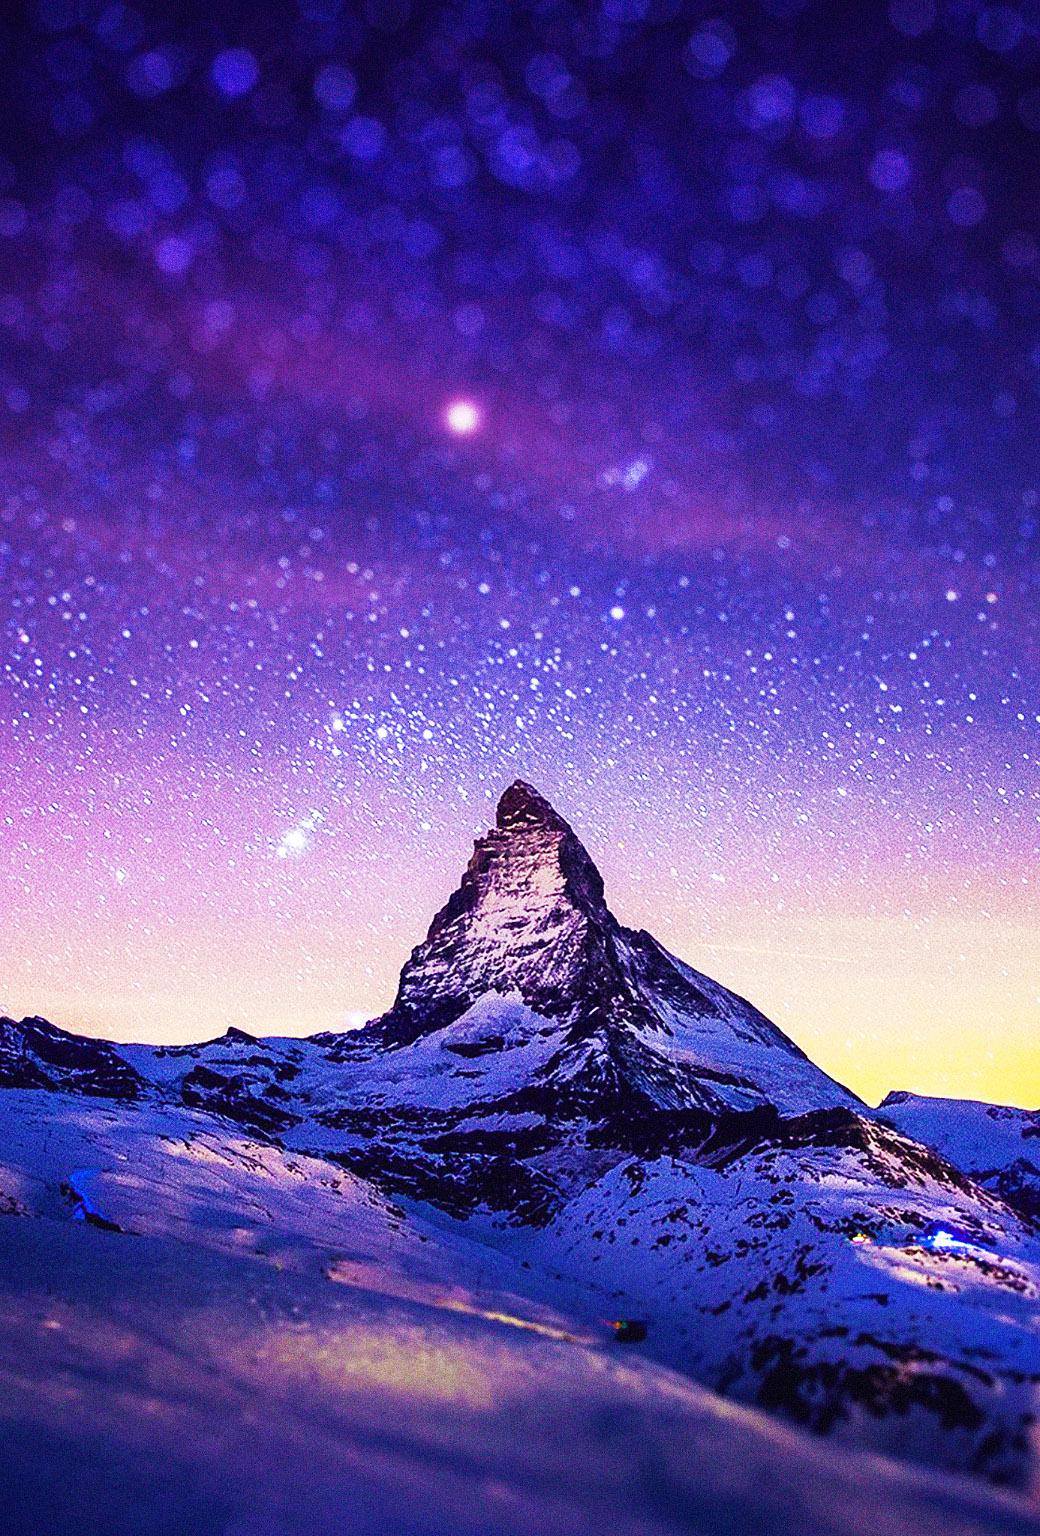 Ios 8 background image - Background Ios Wallpaper Valentine Mountain Flappy Bird Black White